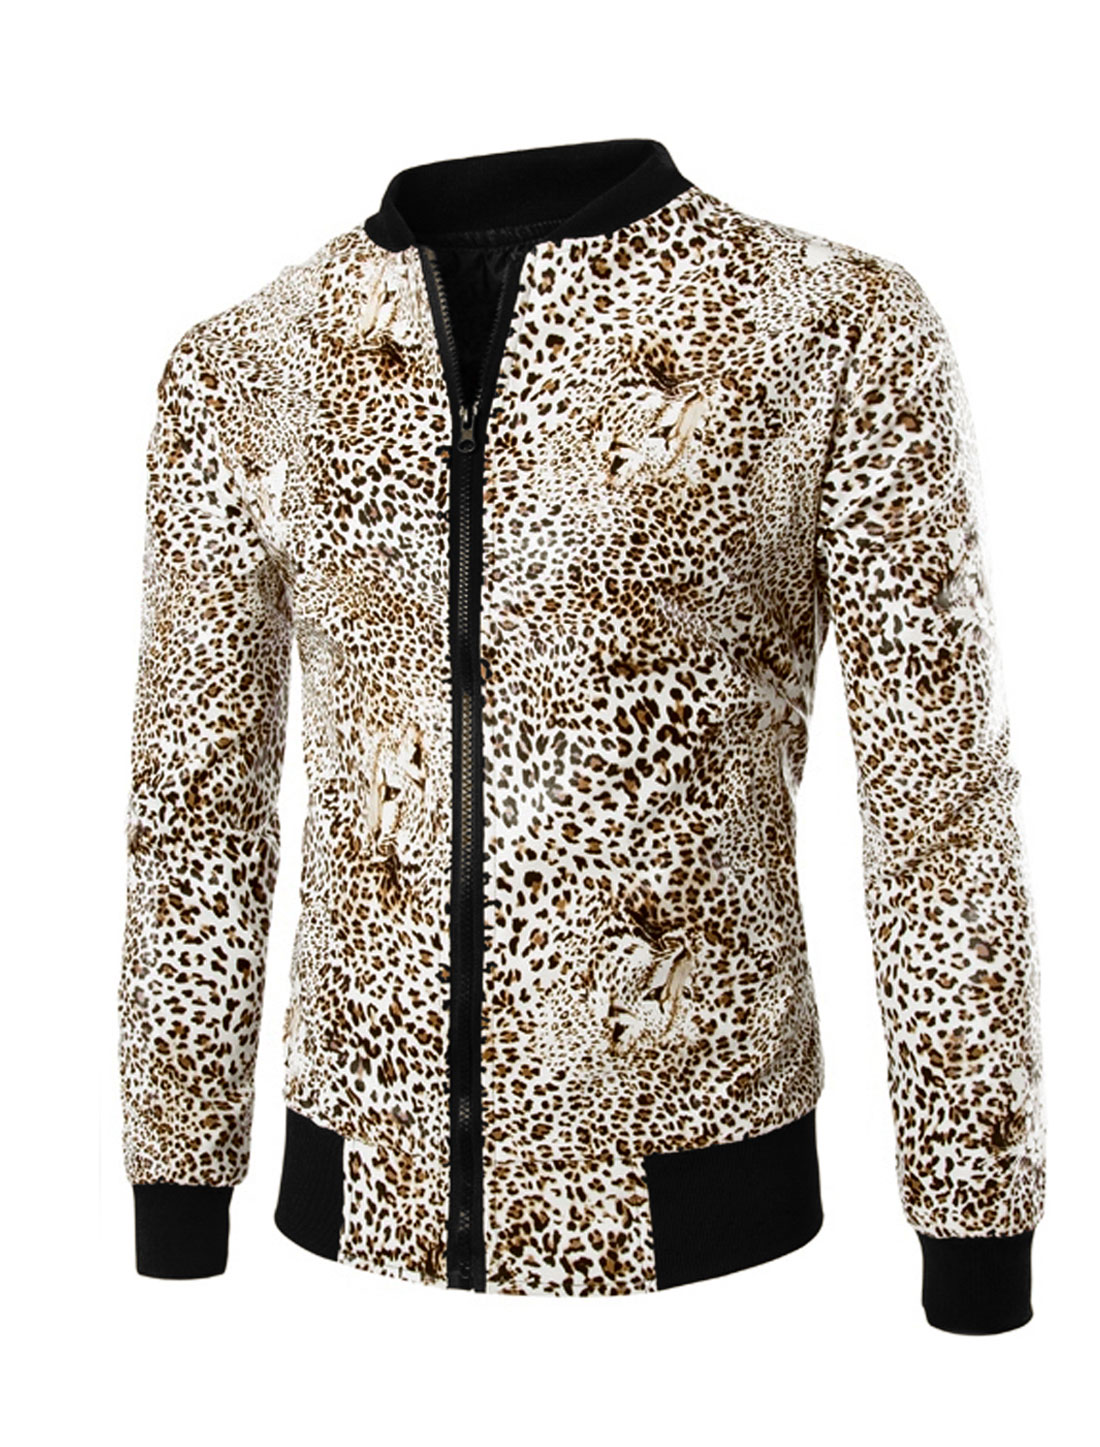 Men Stand Collar Long Sleeves Lined Leopard Prints Bomber Jacket Khaki M